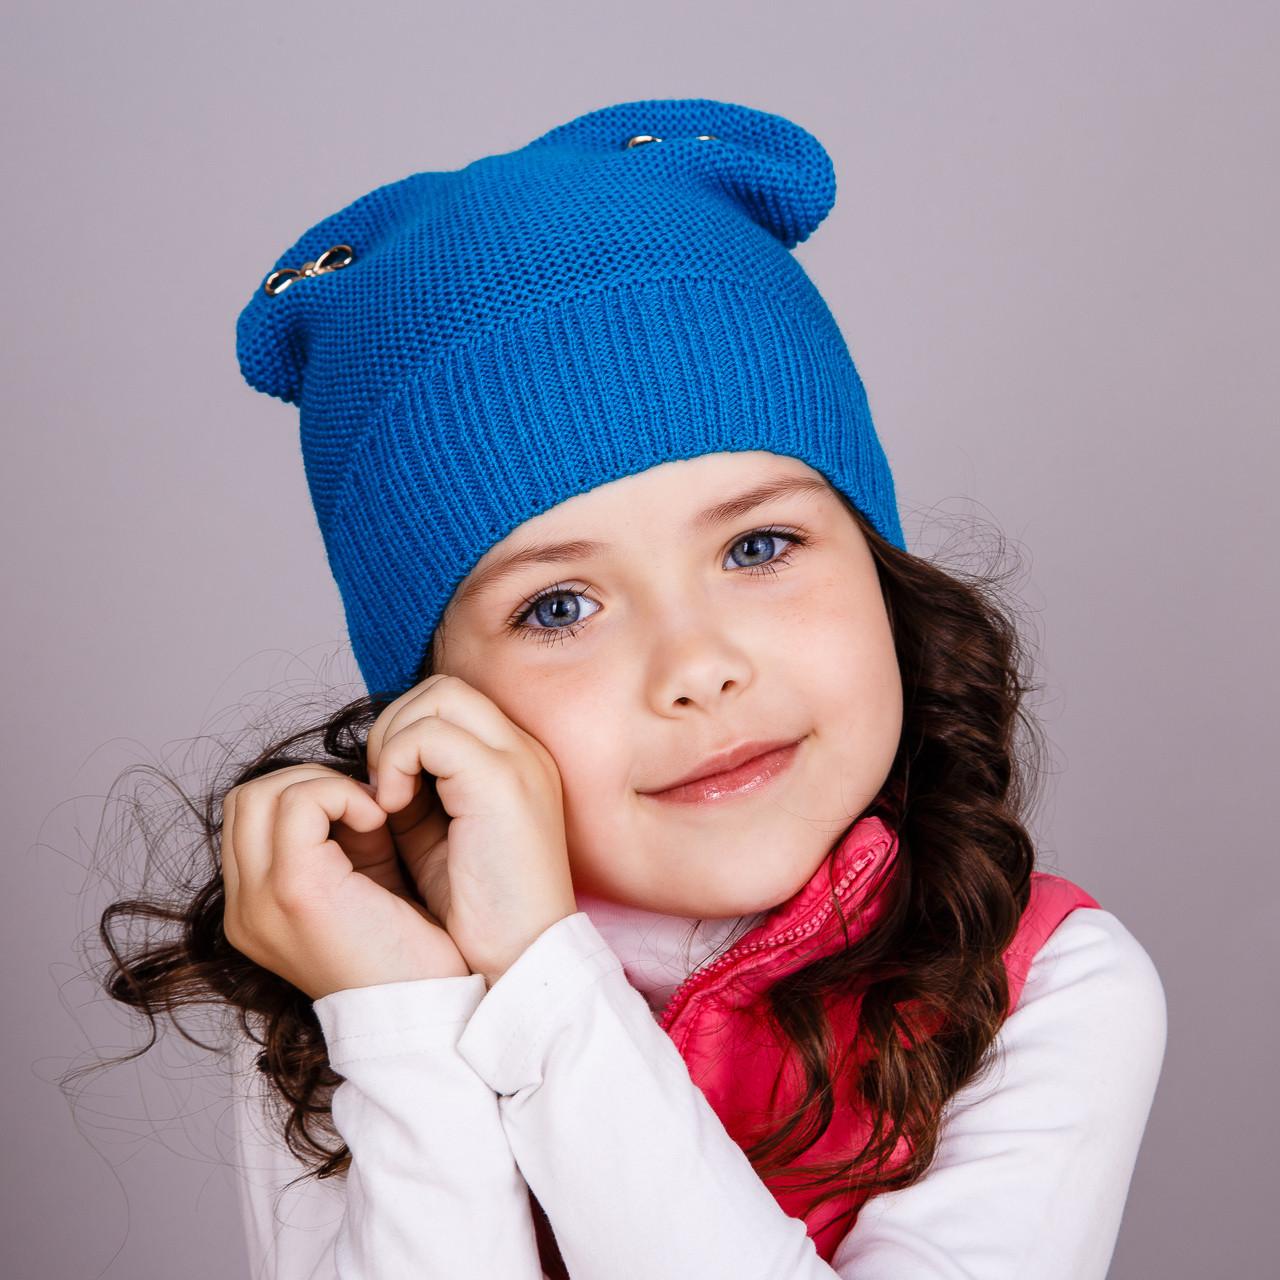 Шапка для девочек осень-зима - Артикул 1742, фото 1